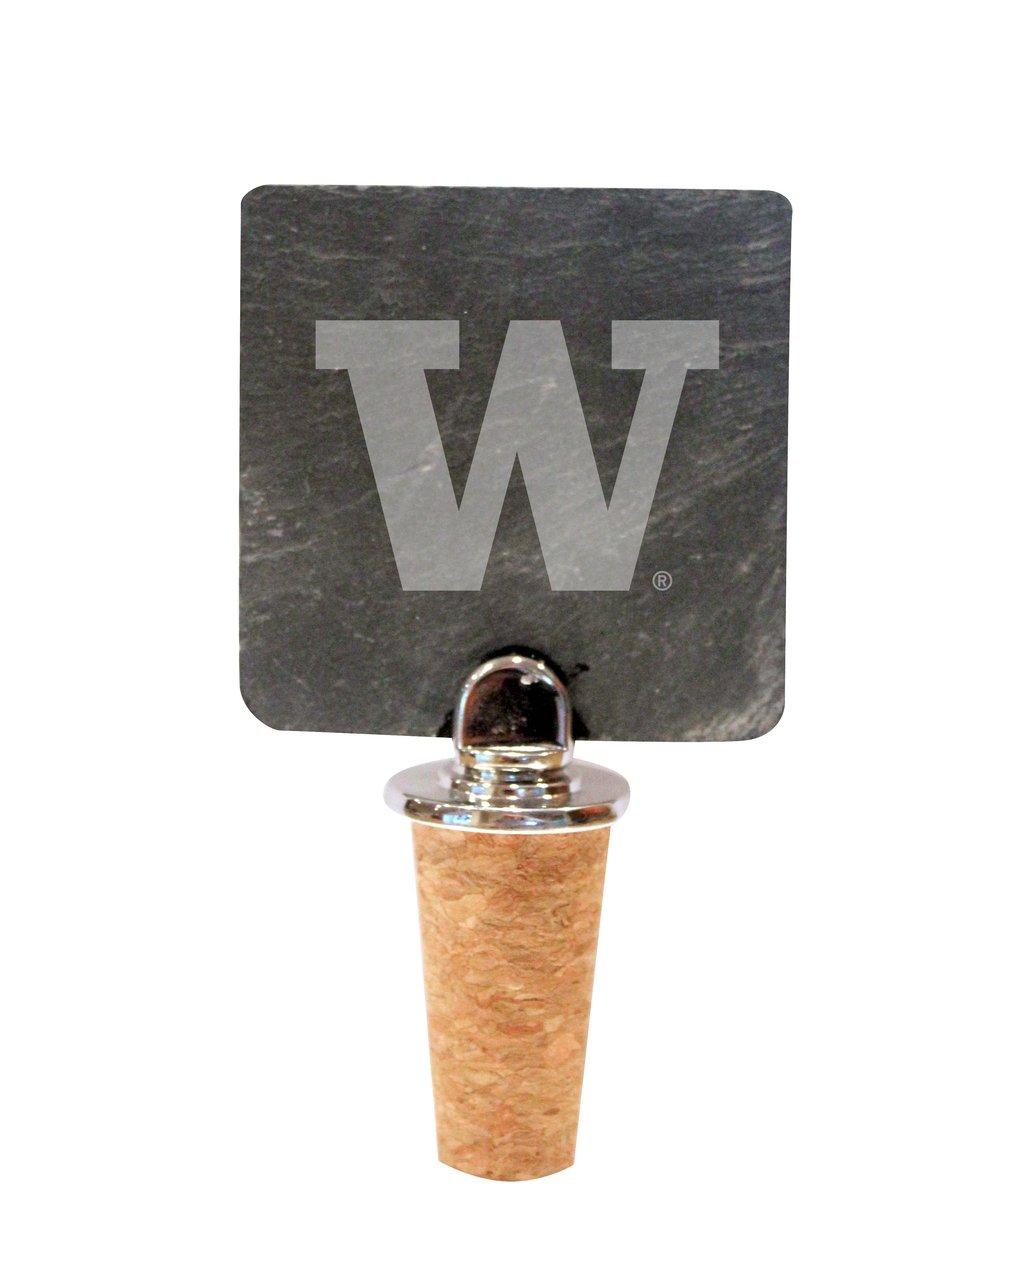 Washington Slate Bottle Stopper